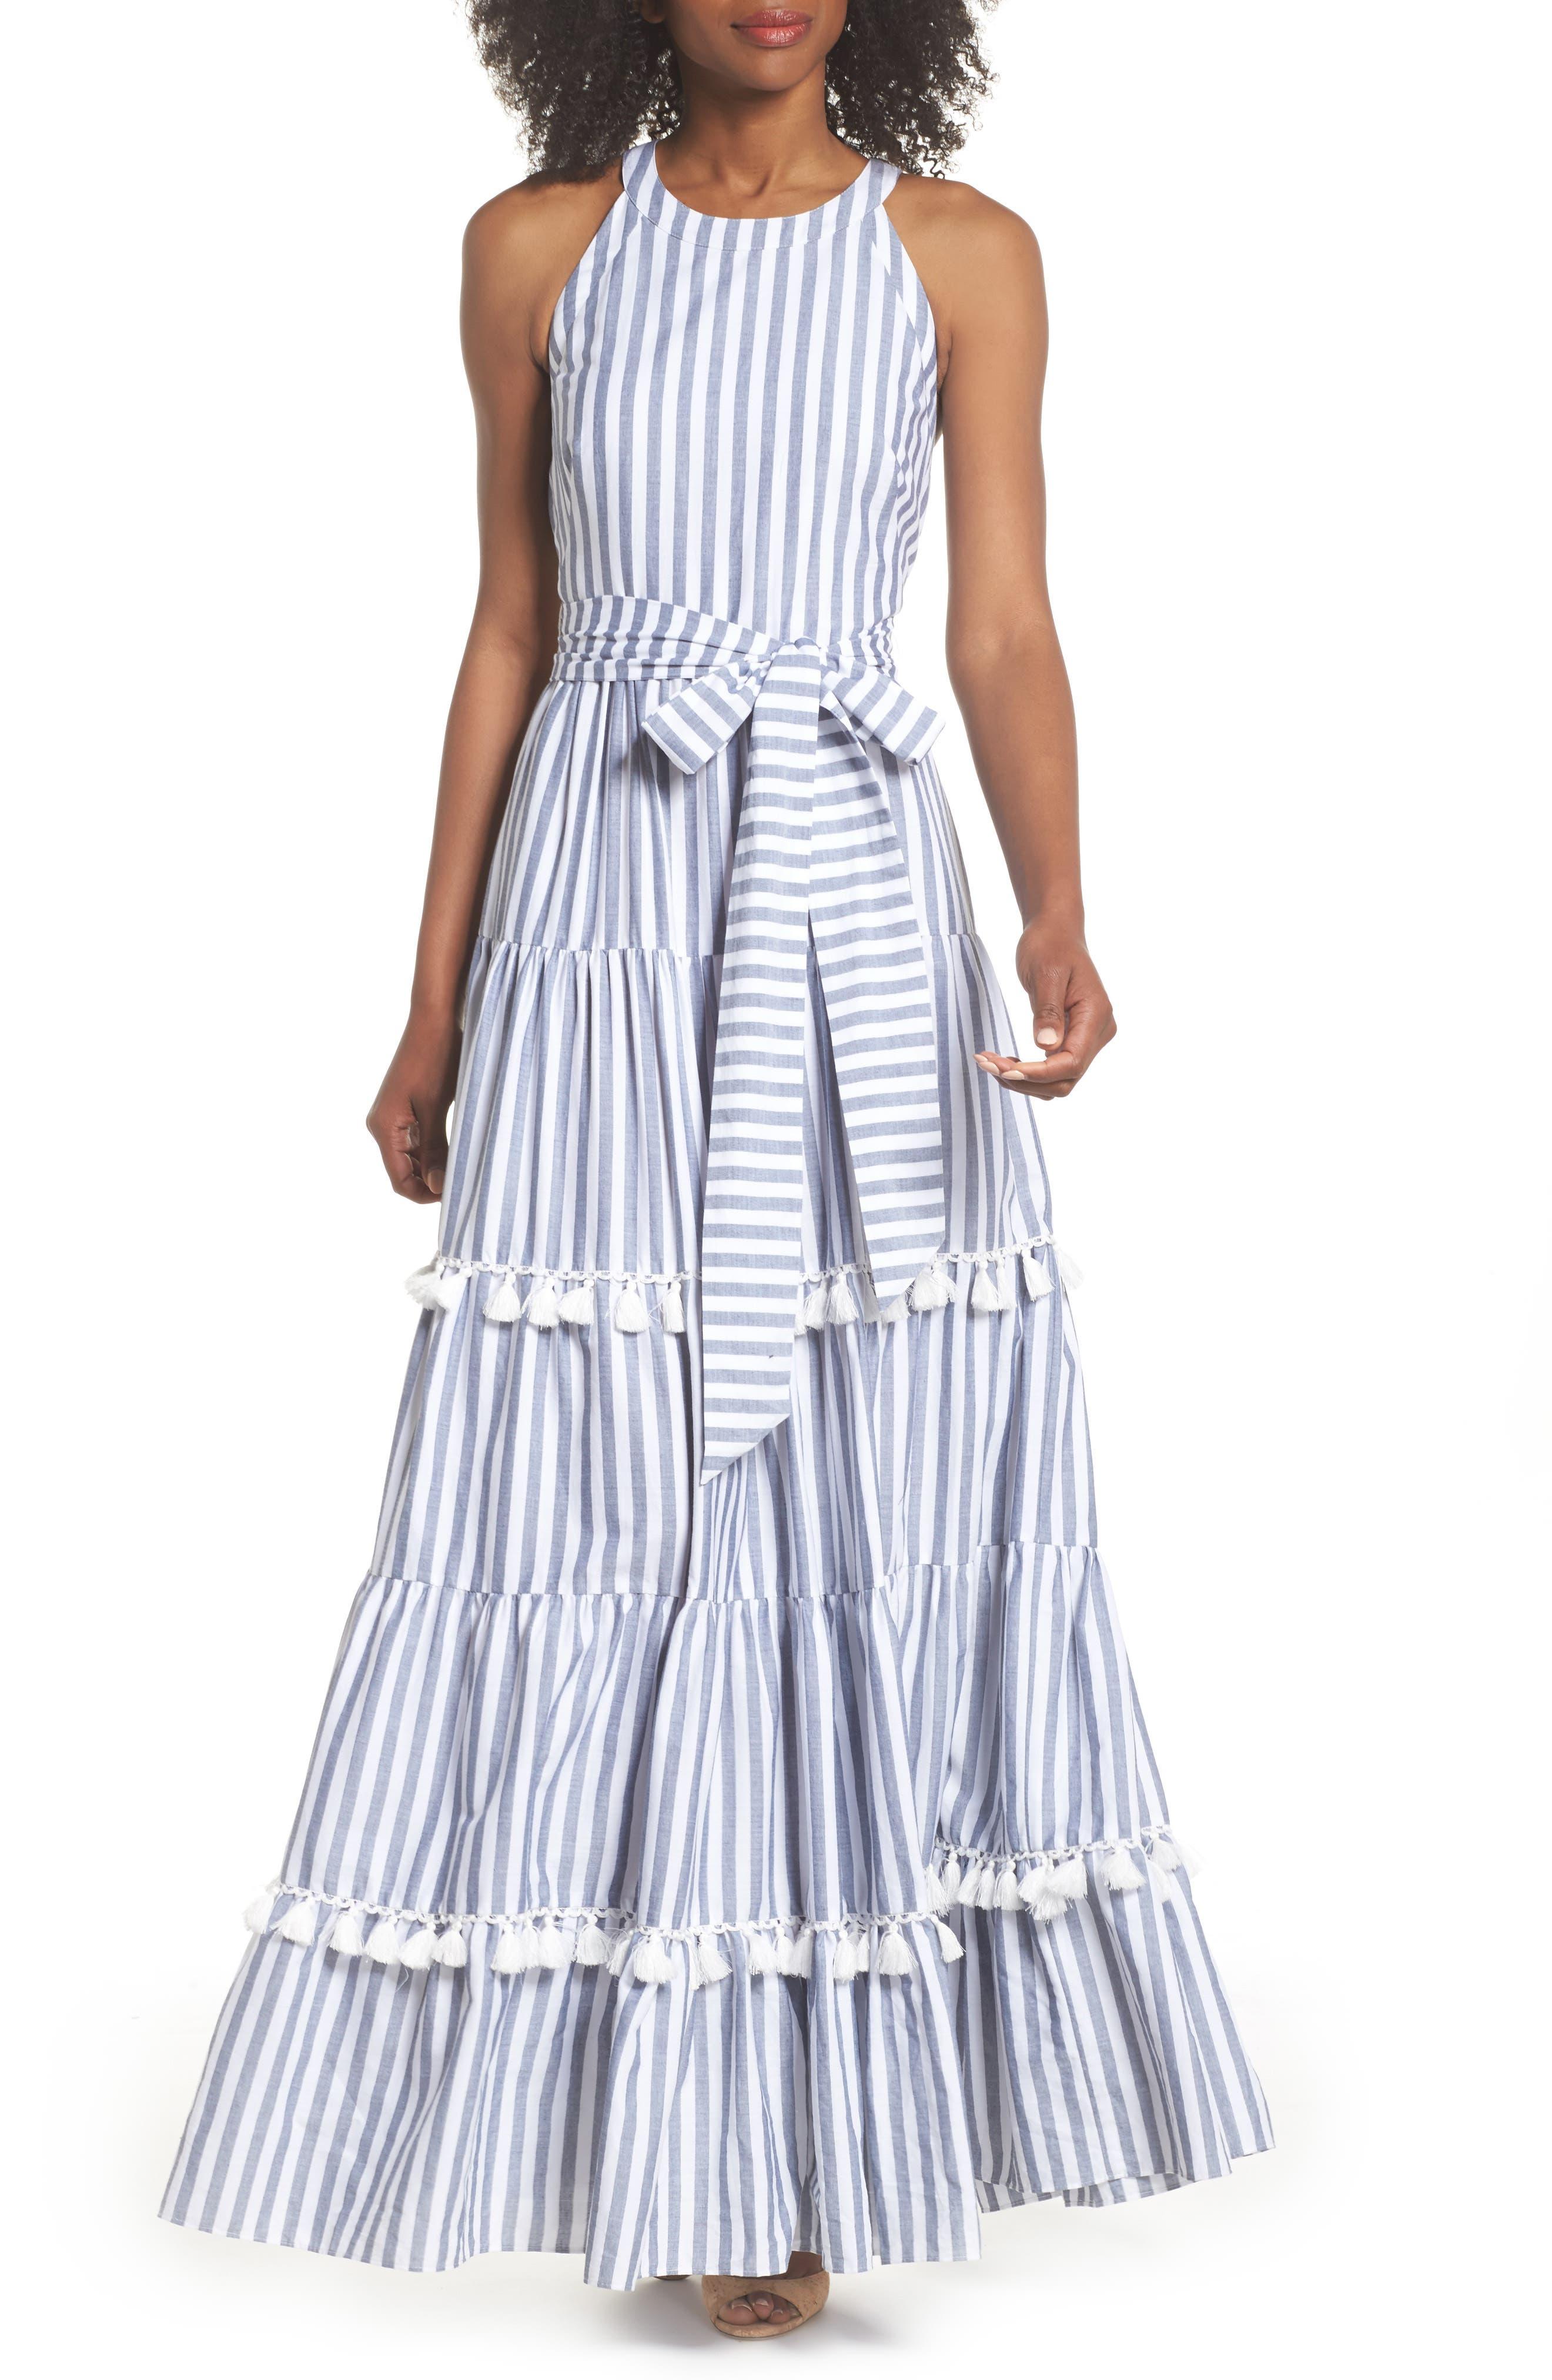 ELIZA J,                             Tiered Tassel Fringe Cotton Maxi Dress,                             Main thumbnail 1, color,                             IVORY/ GREY